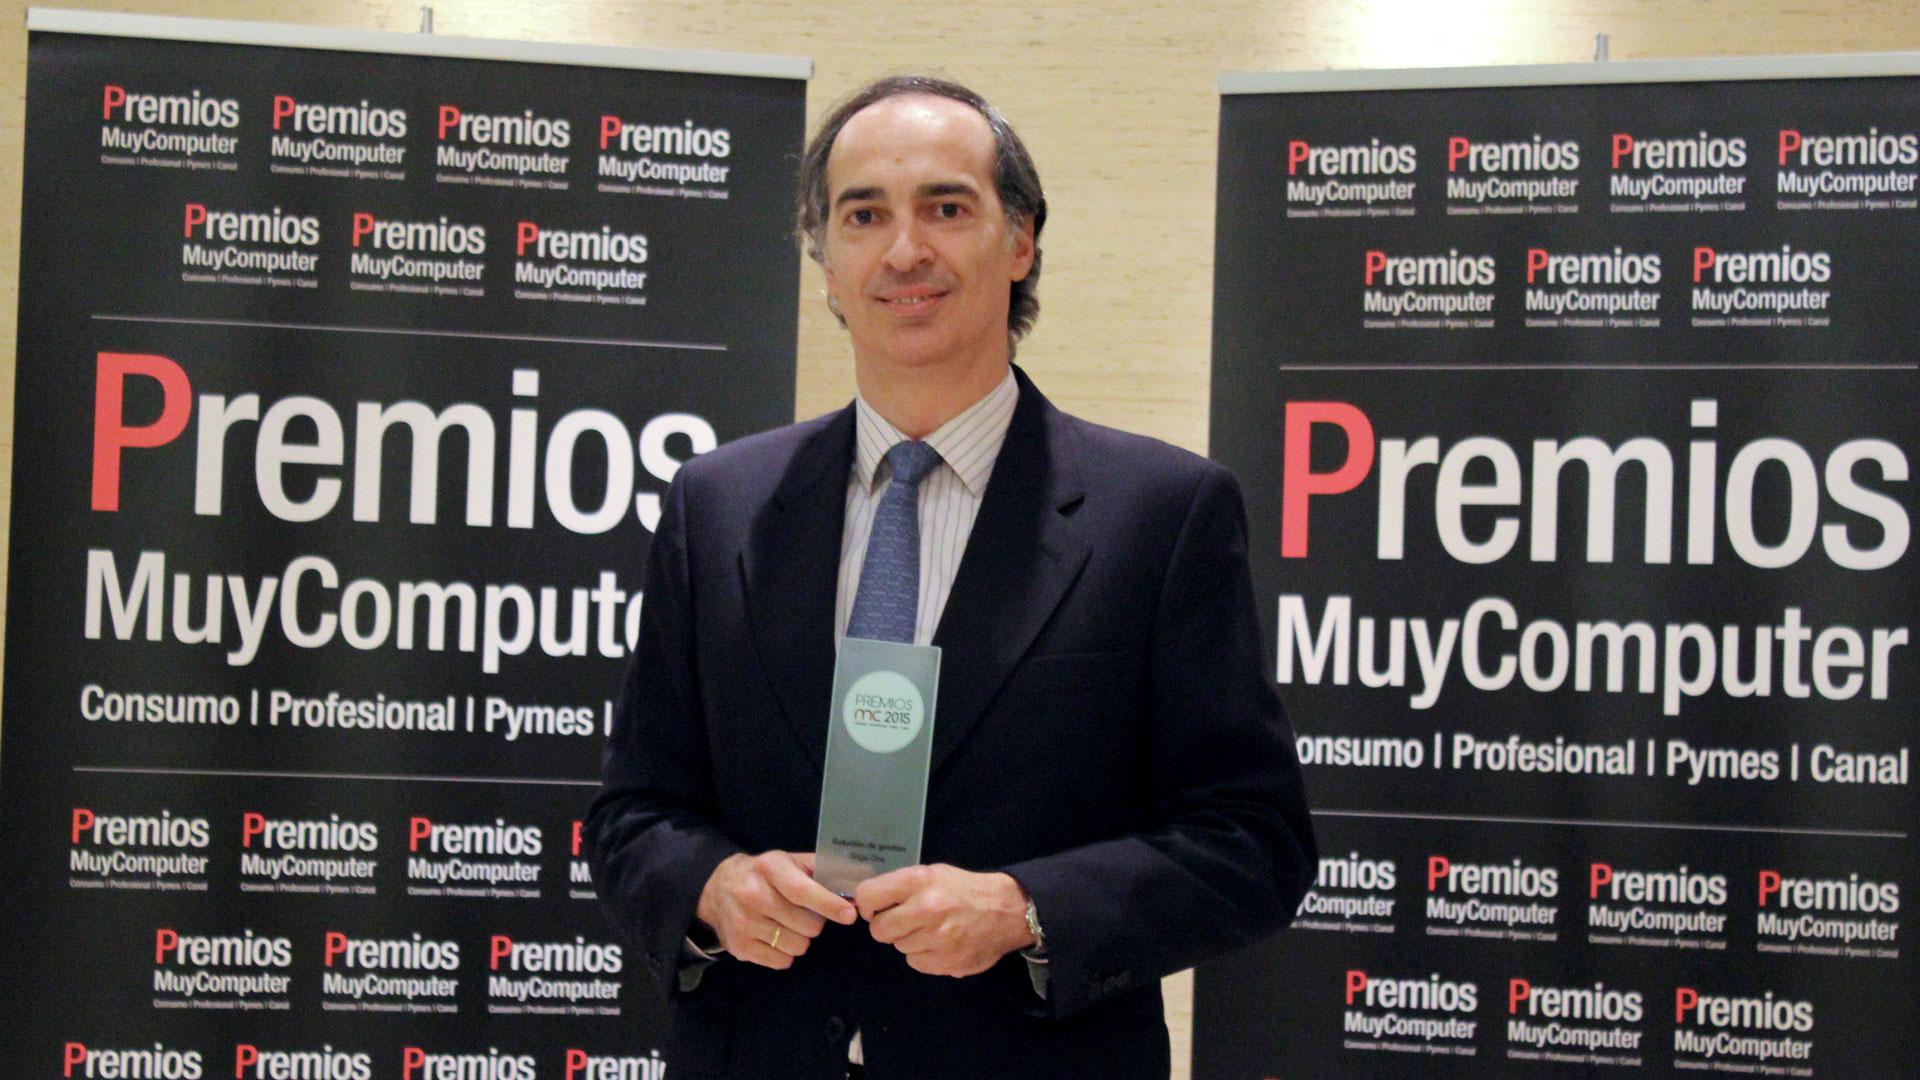 premios-mc2015-sage-one-solucion-gestion